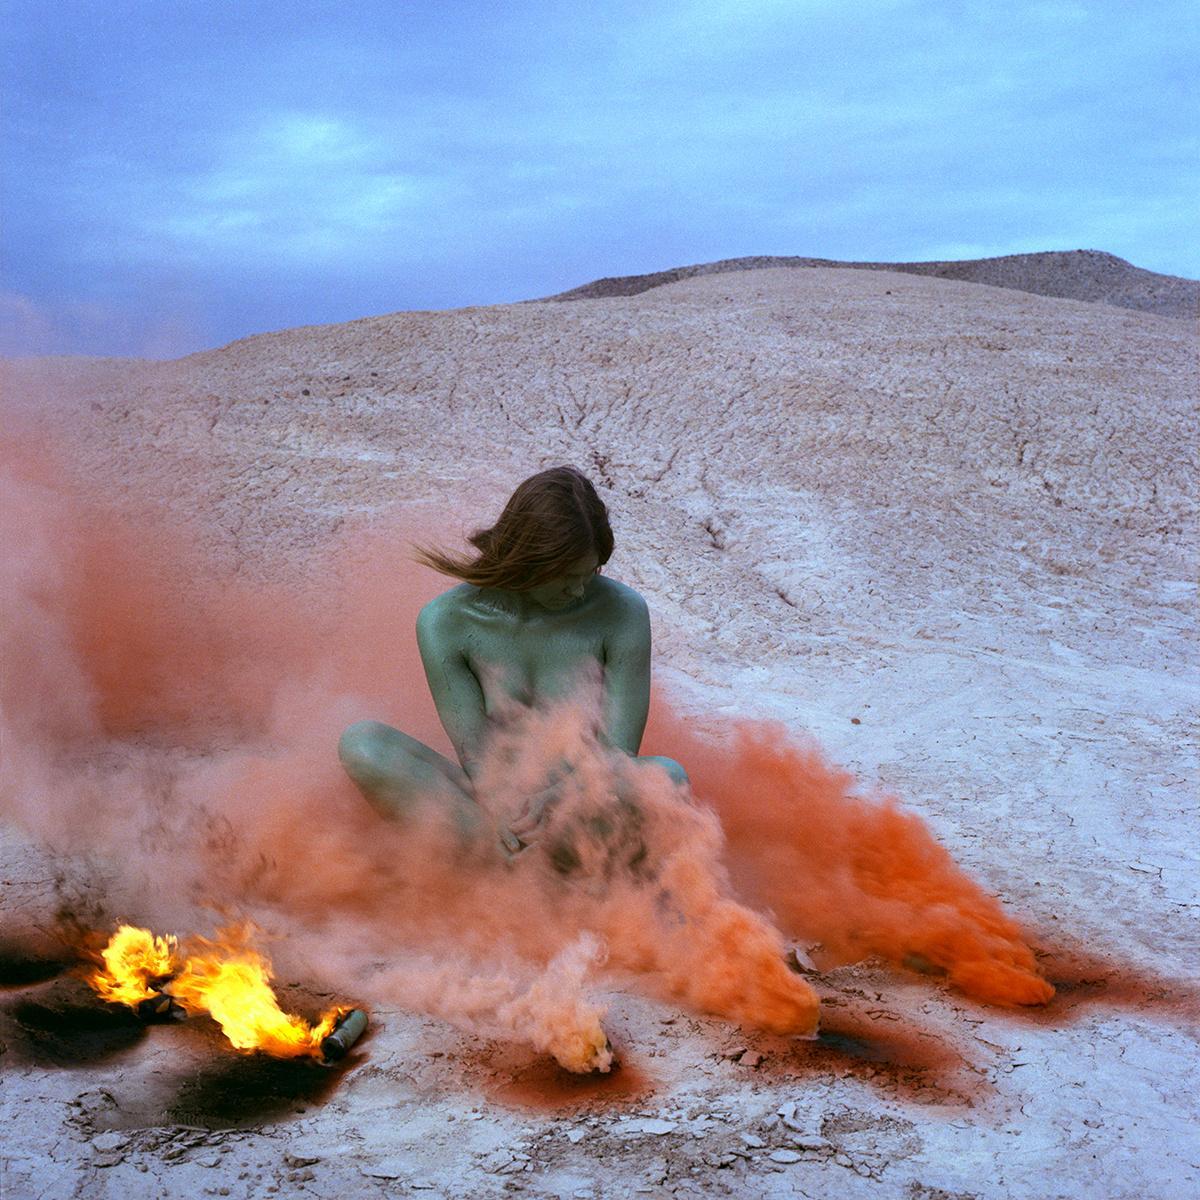 Judy Chicago's Immolation IV: an avenging goddess